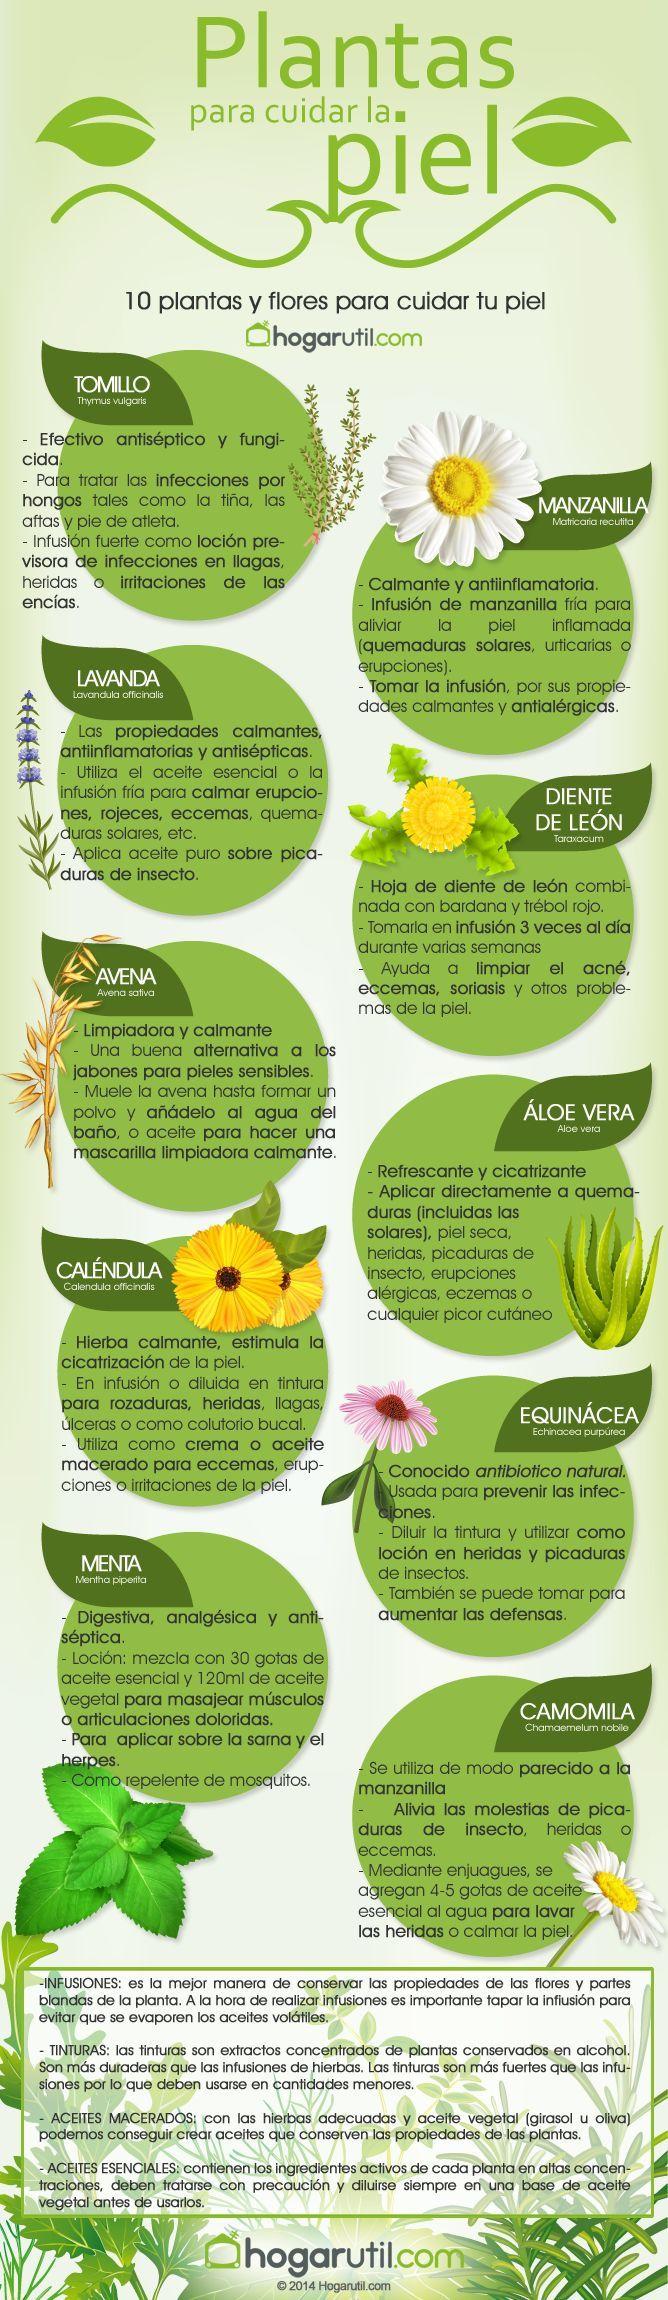 Infograf a plantas para cuidar la piel de salud en infograf as pinterest - Hogarutil plantas ...